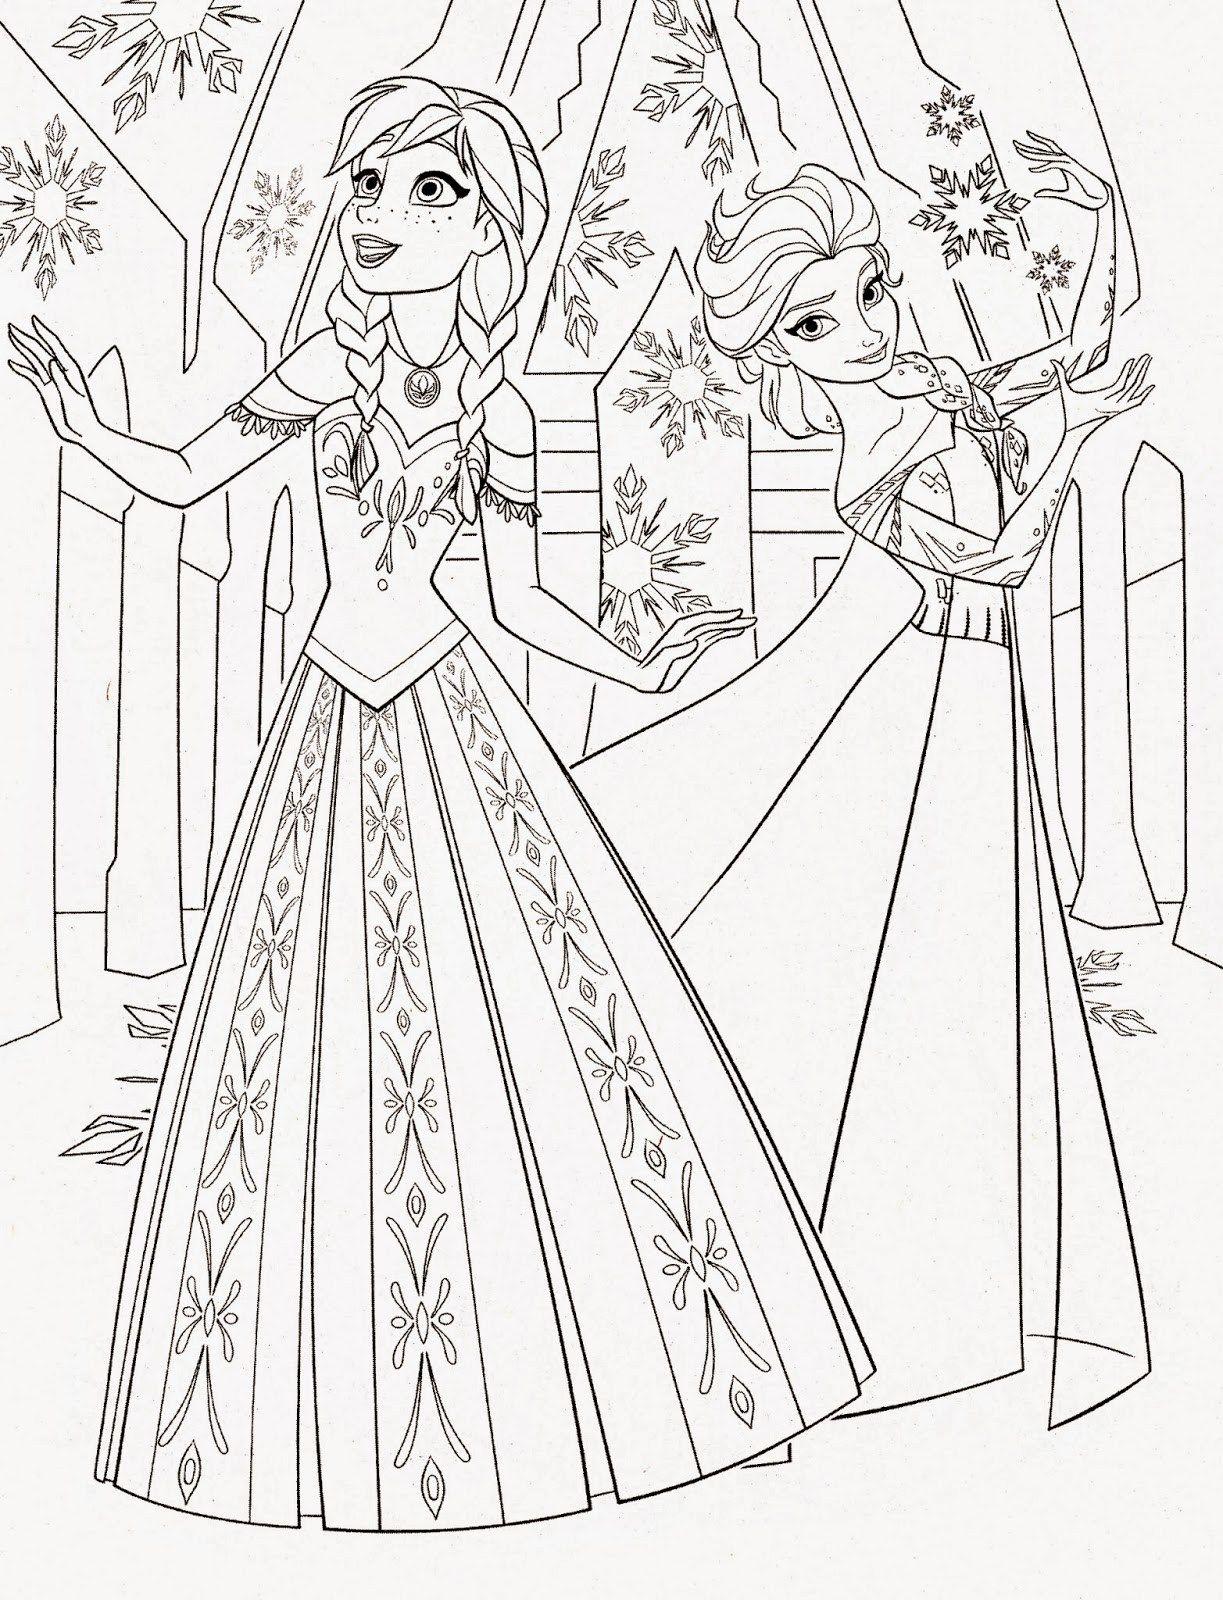 Disney Princess Frozen Elsa And Anna Coloring Pages Jpg 1223 1600 Elsa Coloring Pages Frozen Coloring Pages Disney Princess Coloring Pages